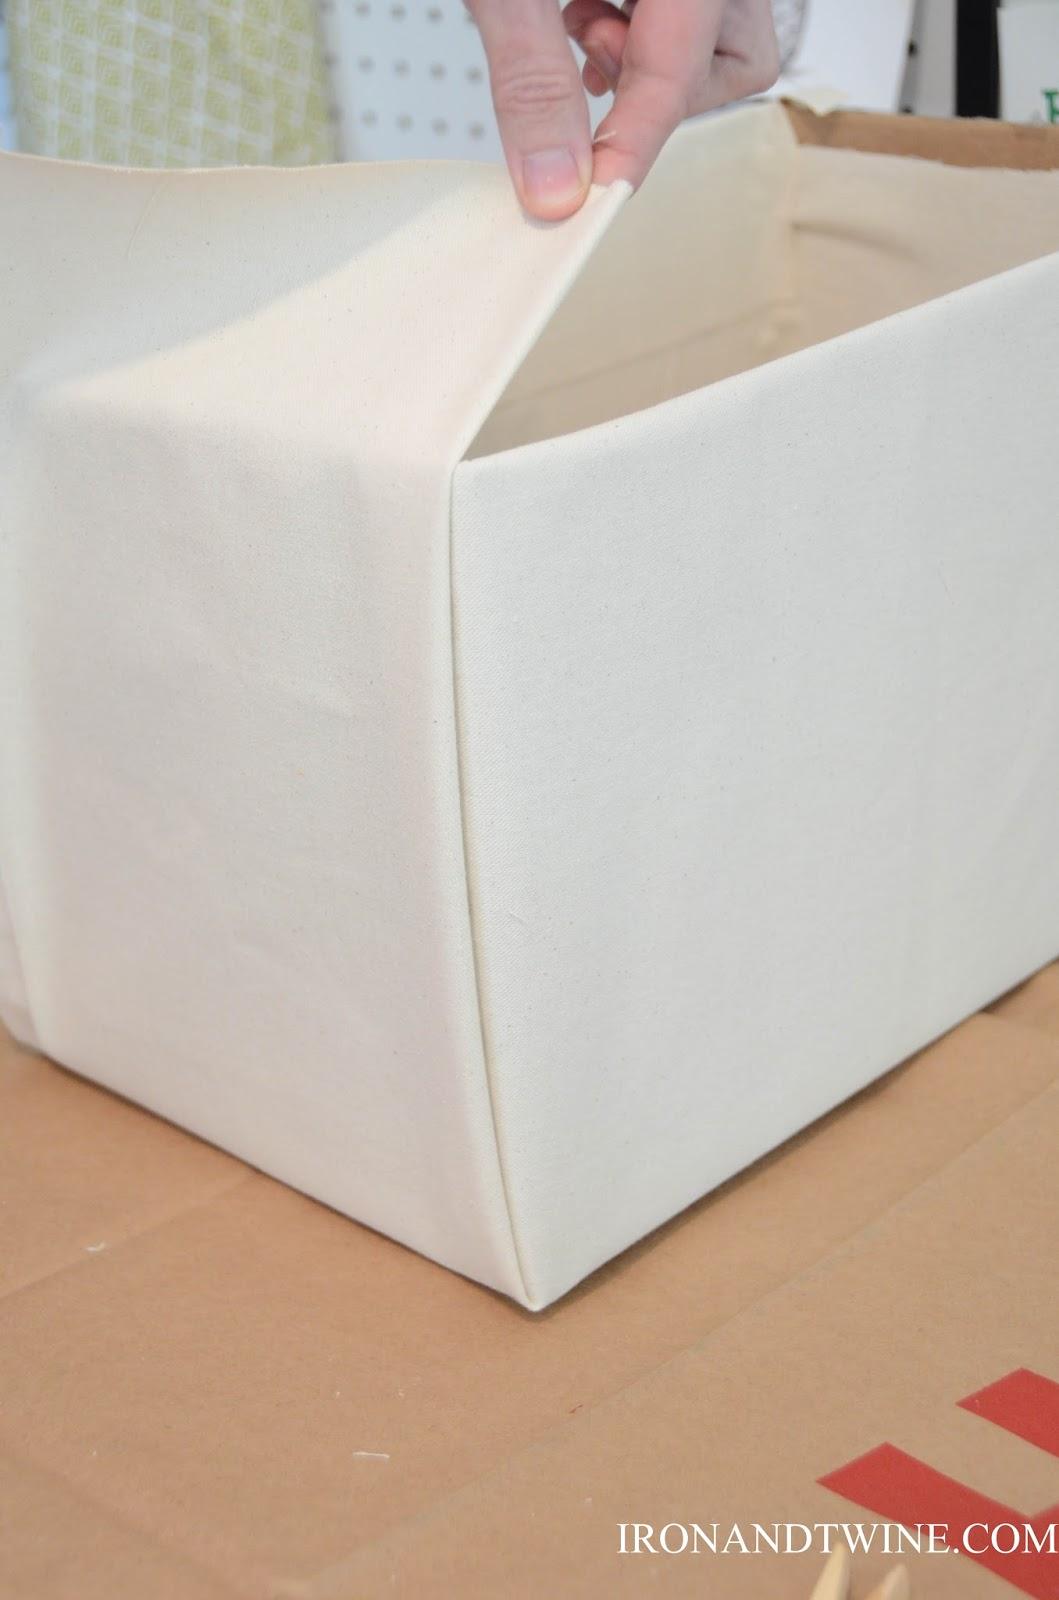 DIY+Belt+Handled+Box,+DIY+fabric+covered+box,+Iron+and+Twine+(27).jpg